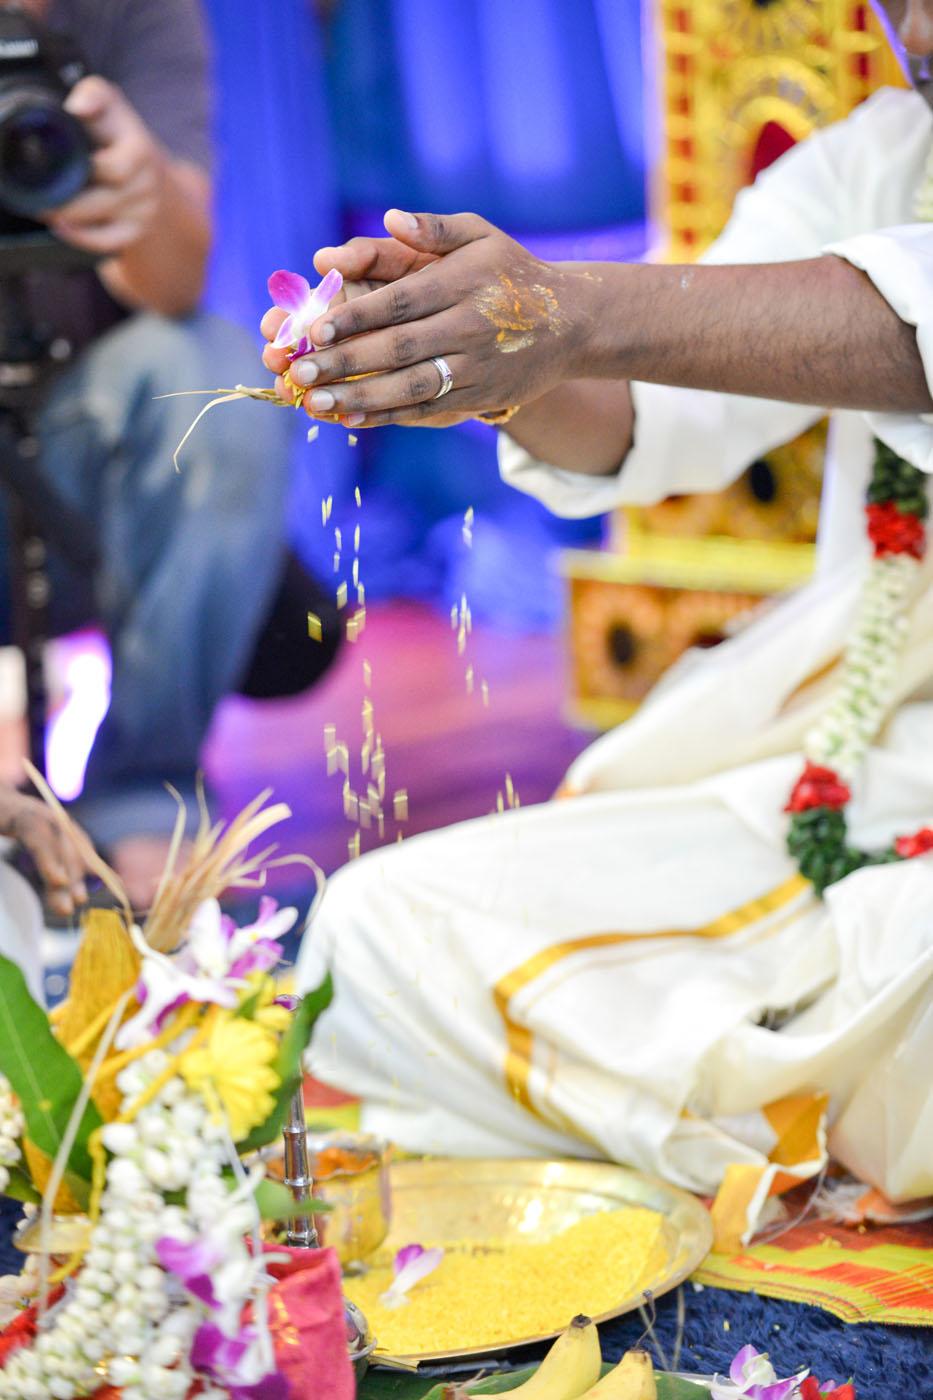 Amore_Production_Indian_Wedding_Photographer (4)